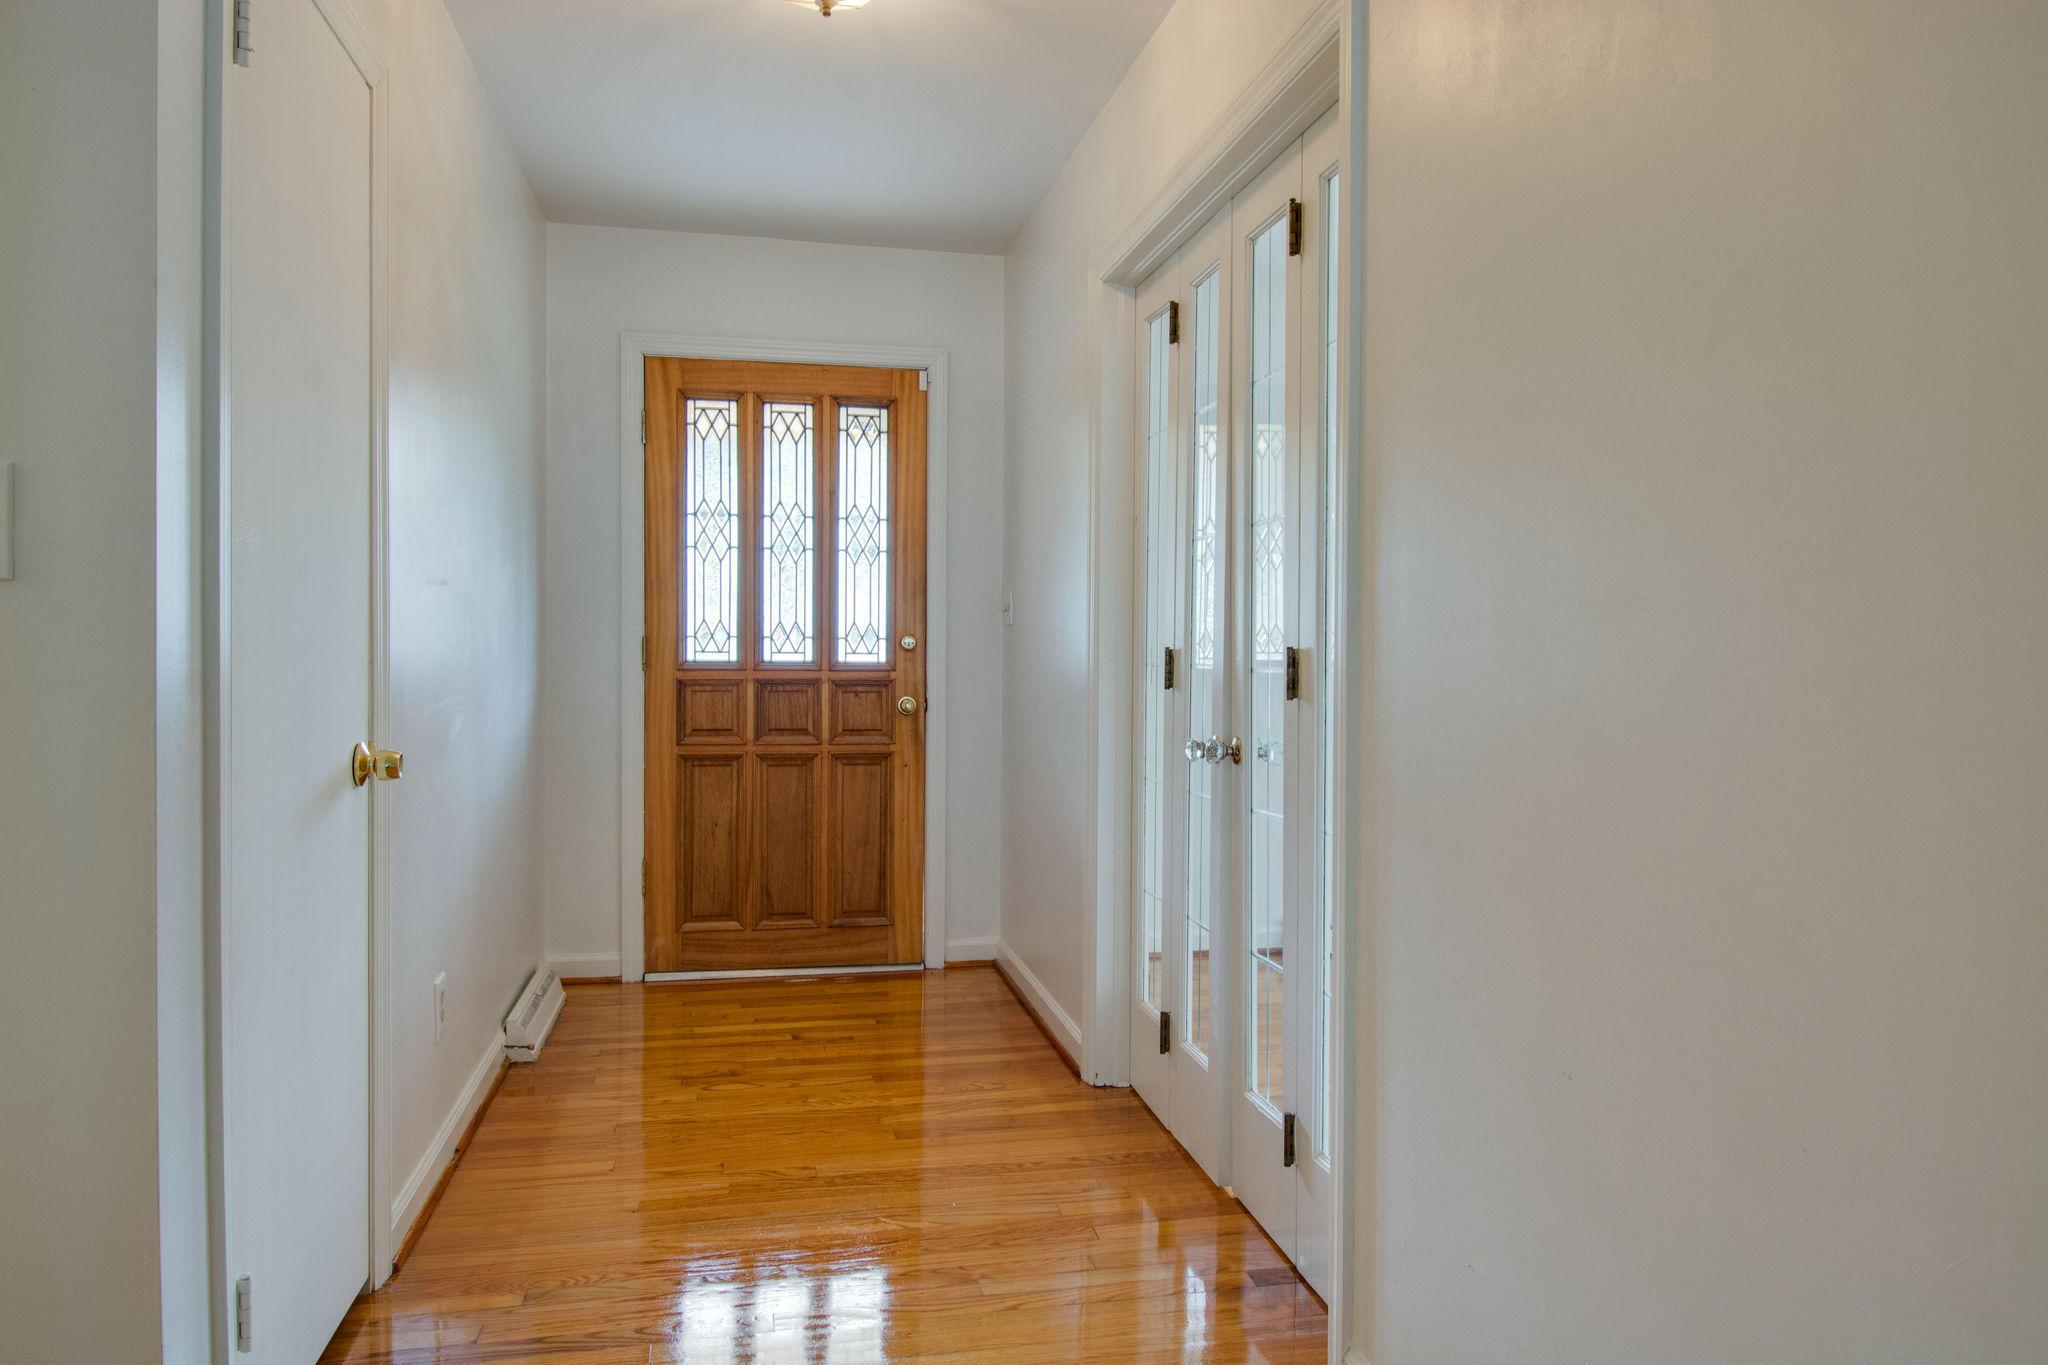 Northbridge Terrace Homes For Sale - 1114 Northbridge, Charleston, SC - 2